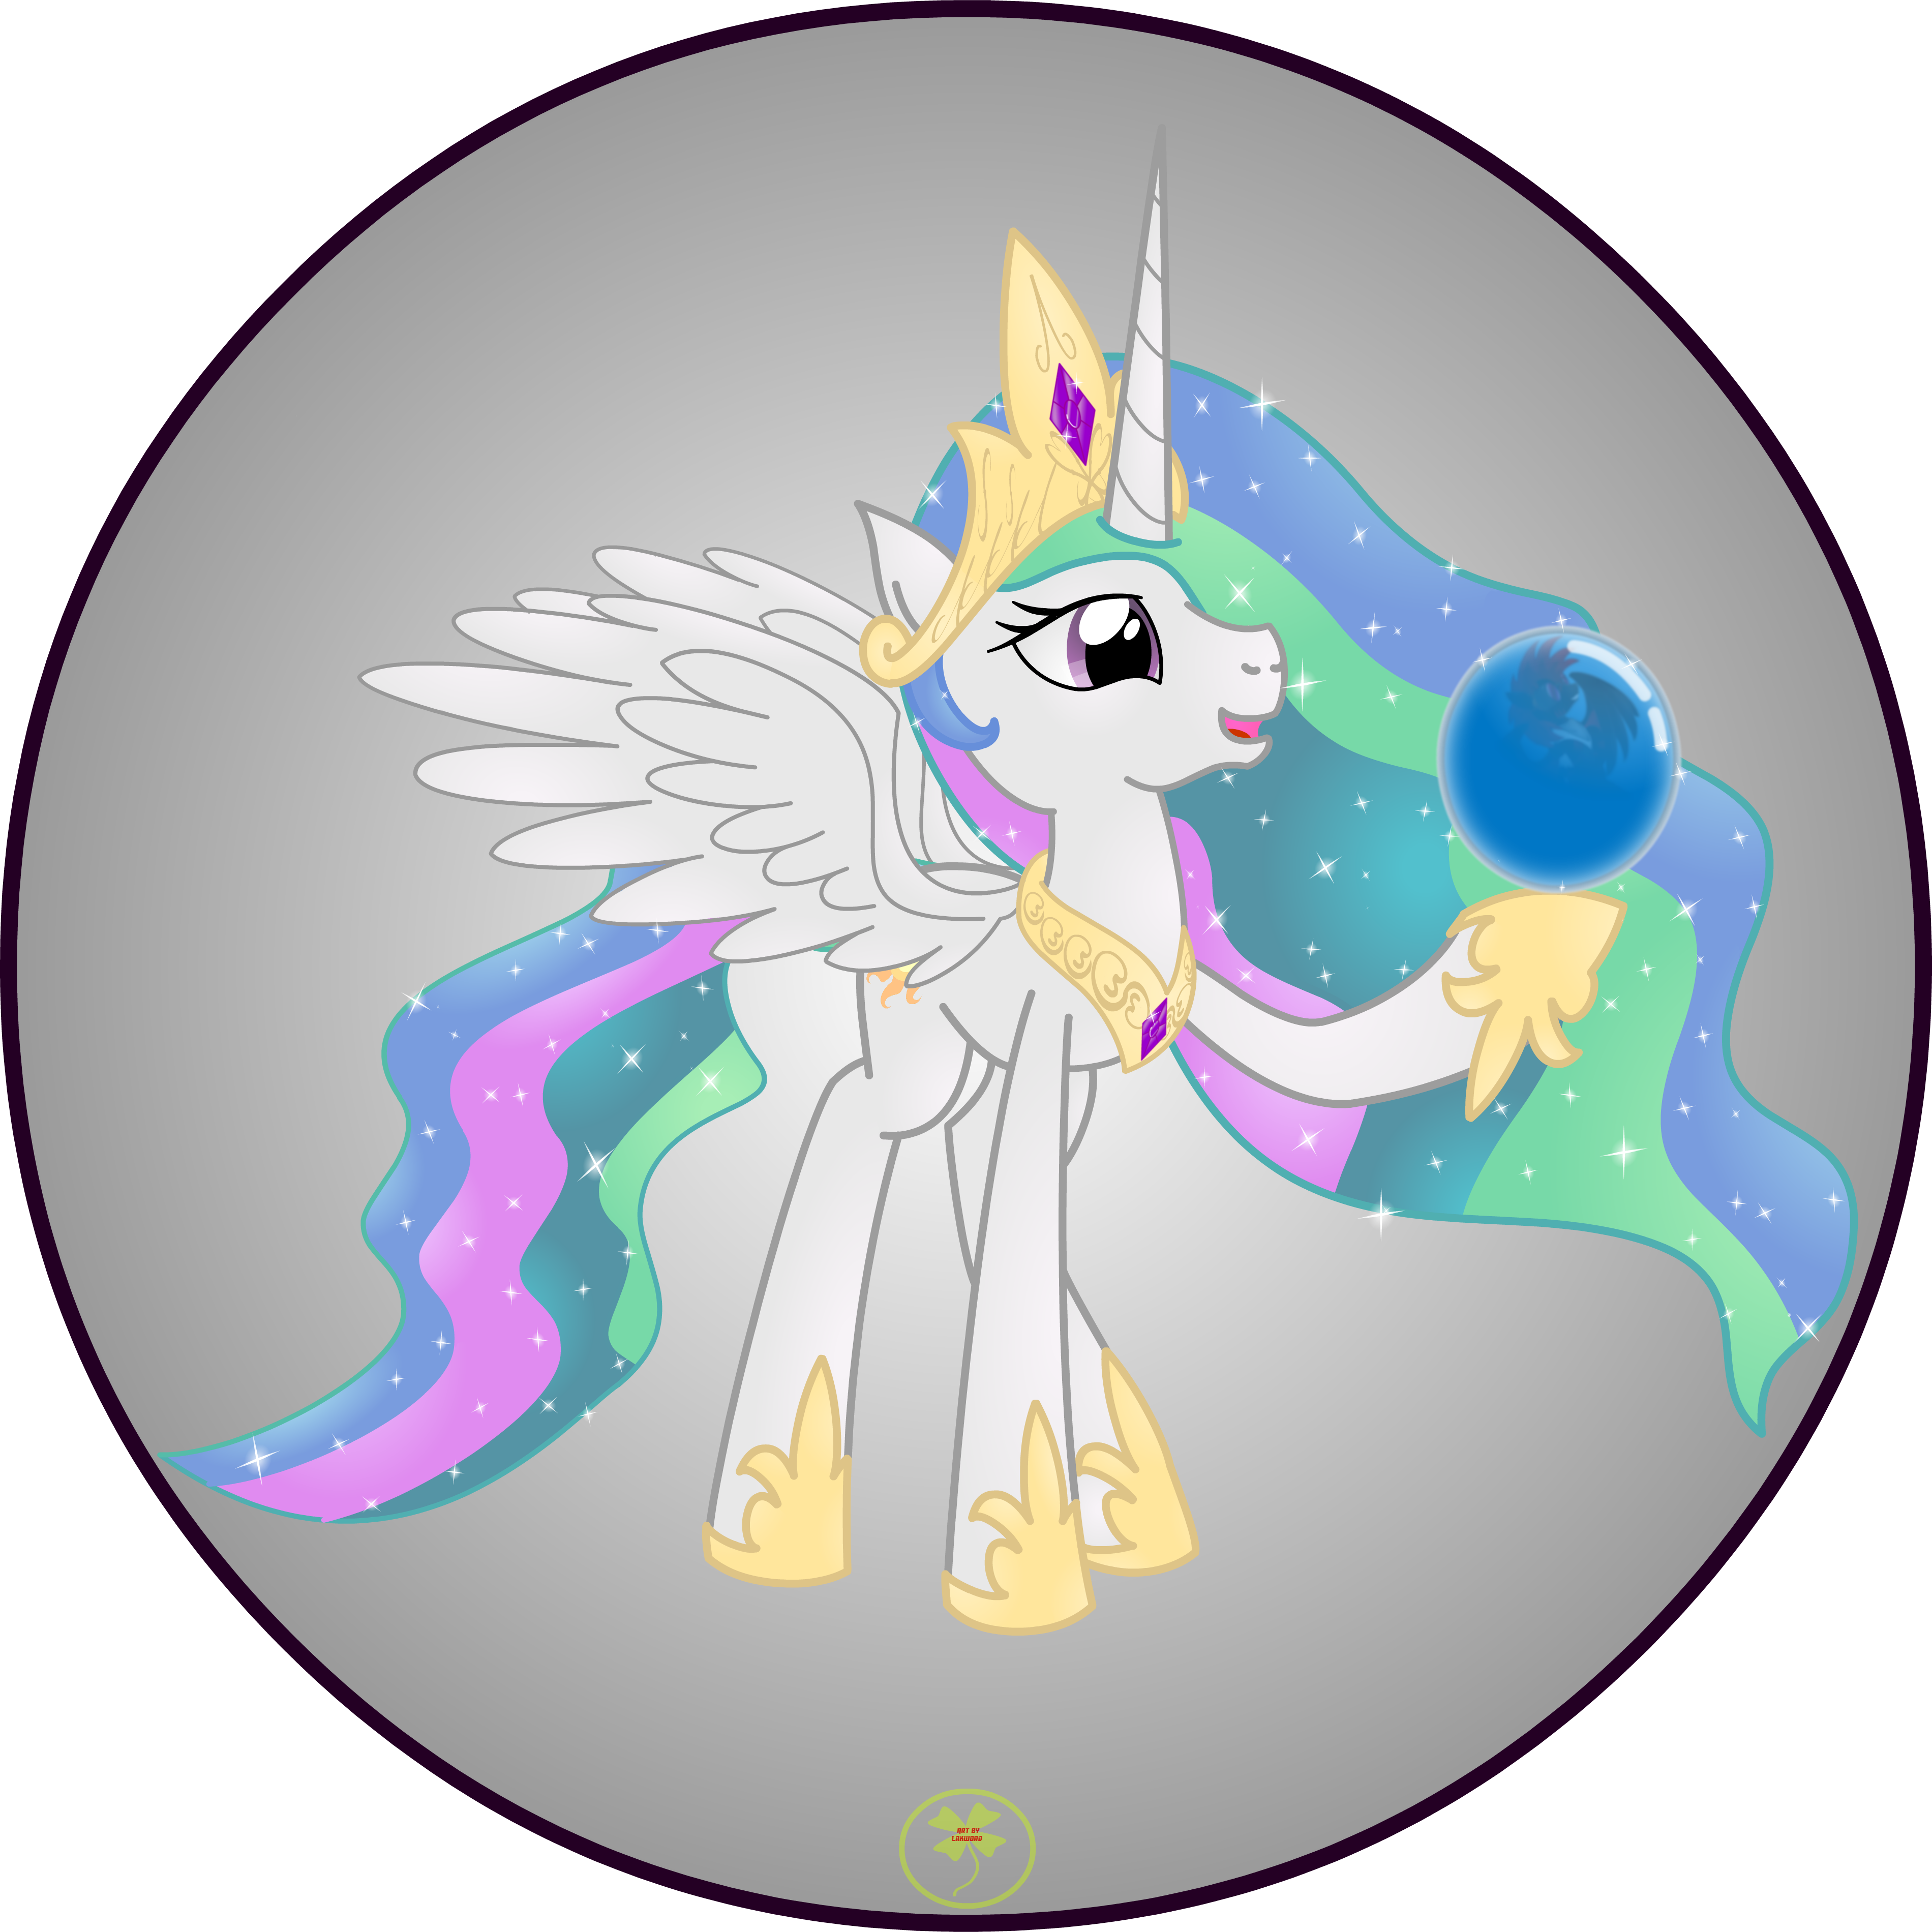 Princess Celestia by Lakword